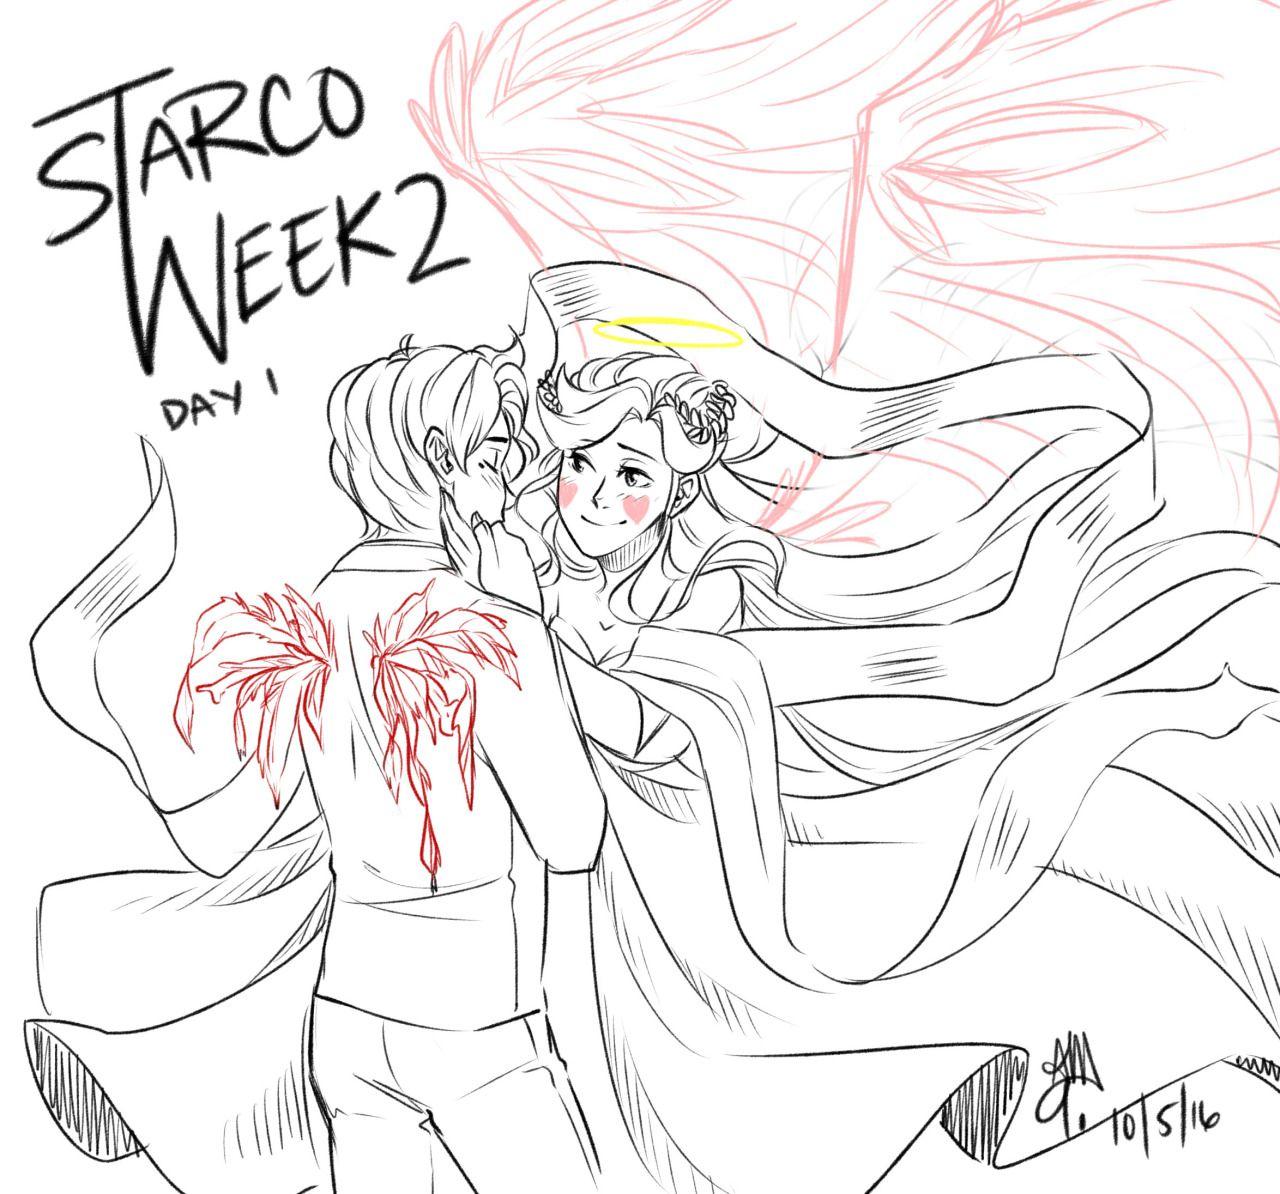 starcoweek2 Starco Week 2 Day 1 - Angel and Devil AU My idea is that ...